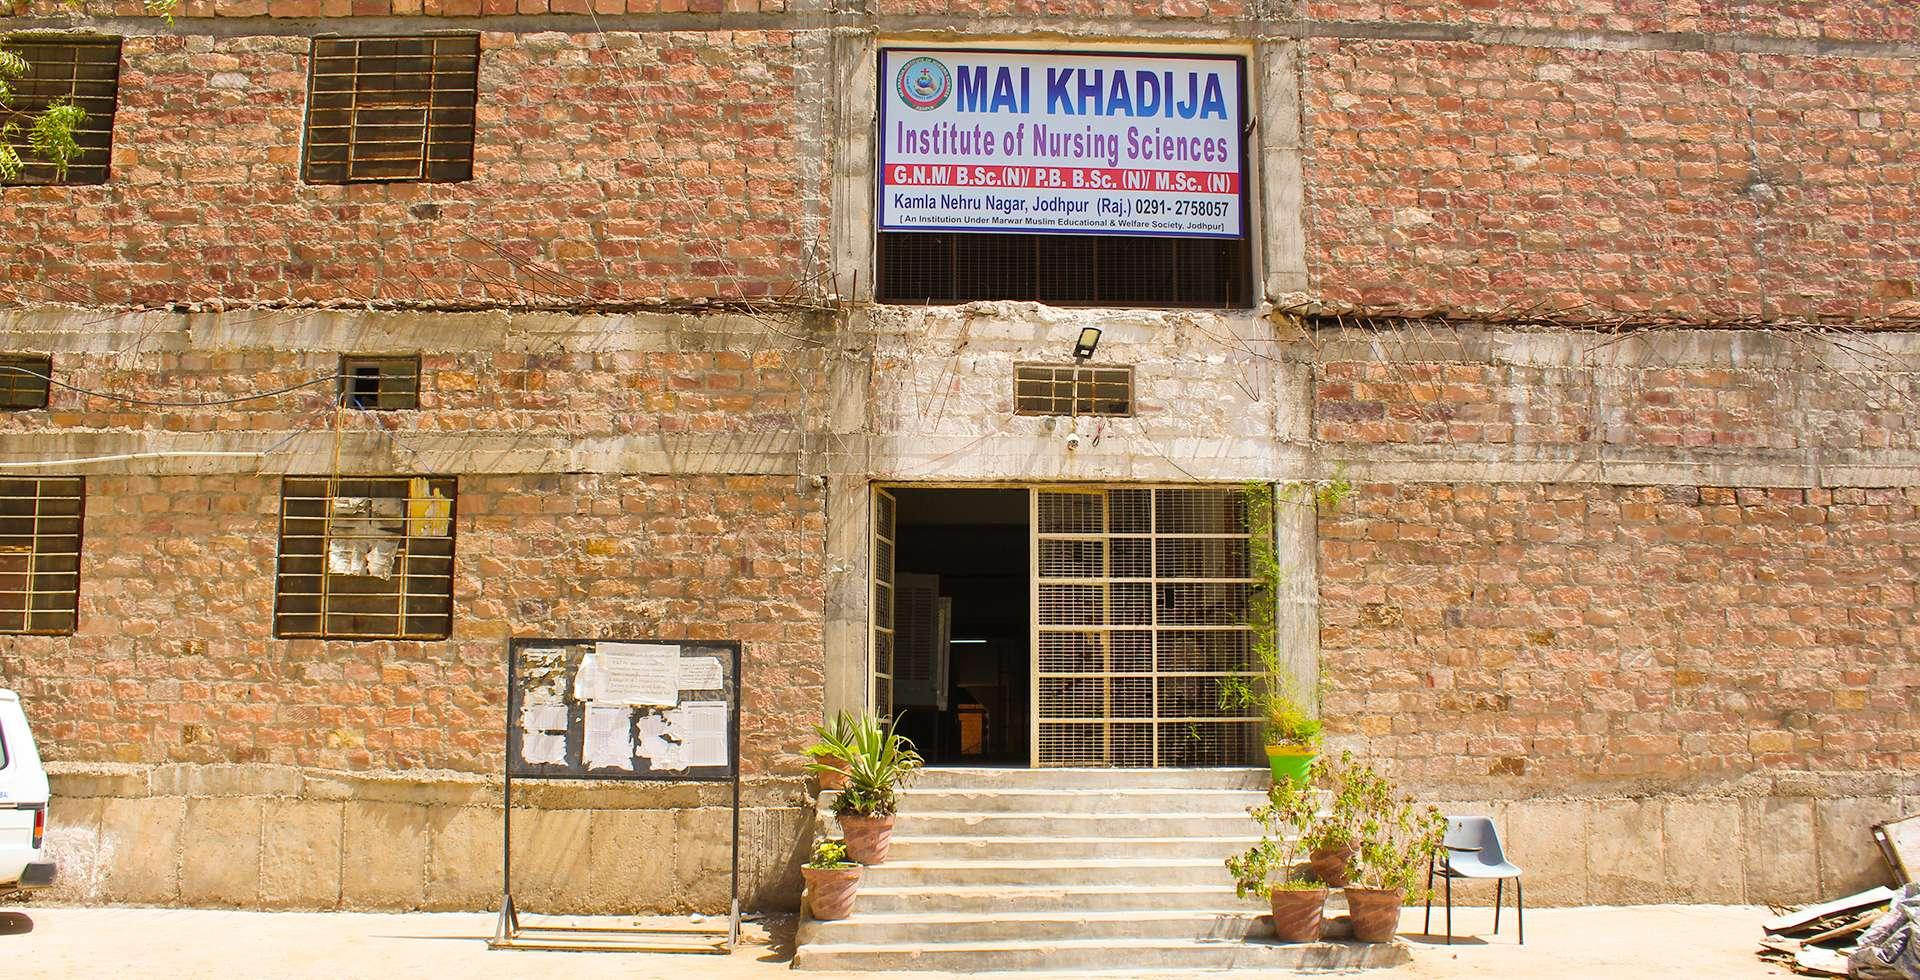 Mai Khadija Institute of Nursing Sciences, Jodhpur Image